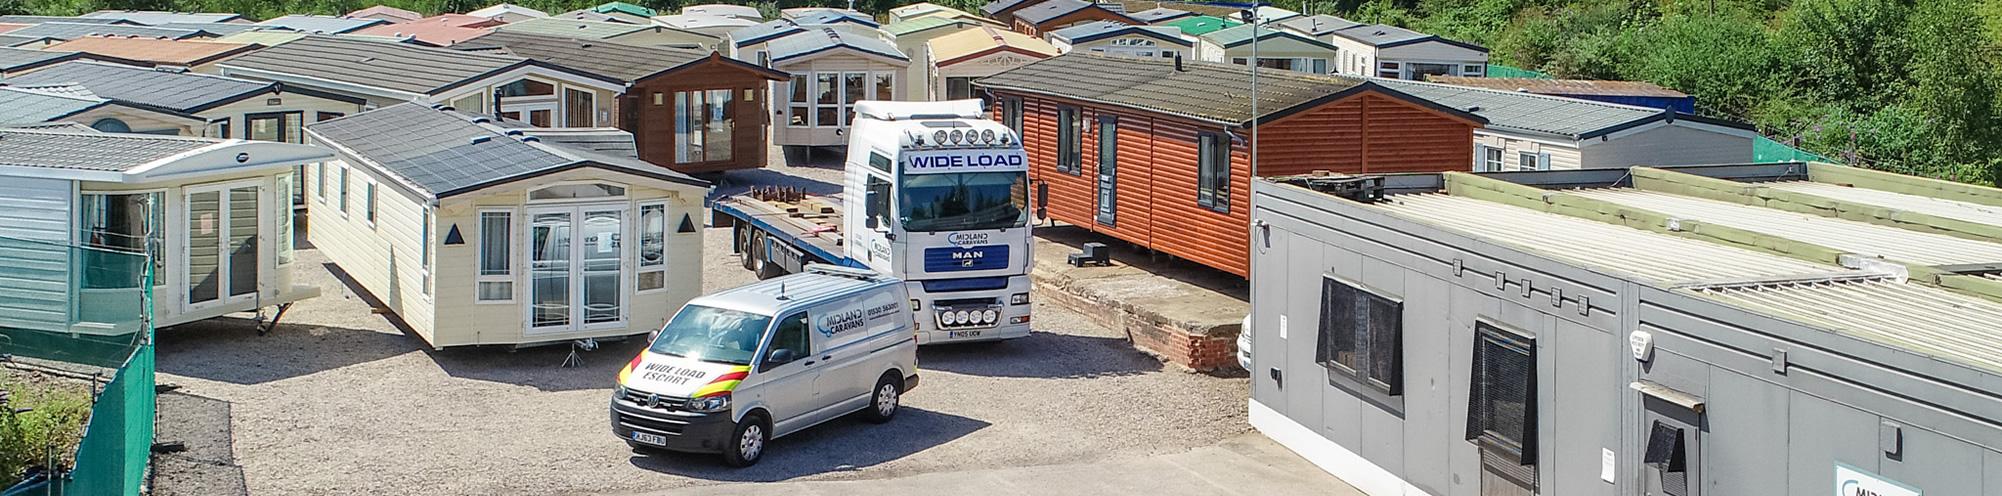 Static Caravan, Used Static Caravans For Sale